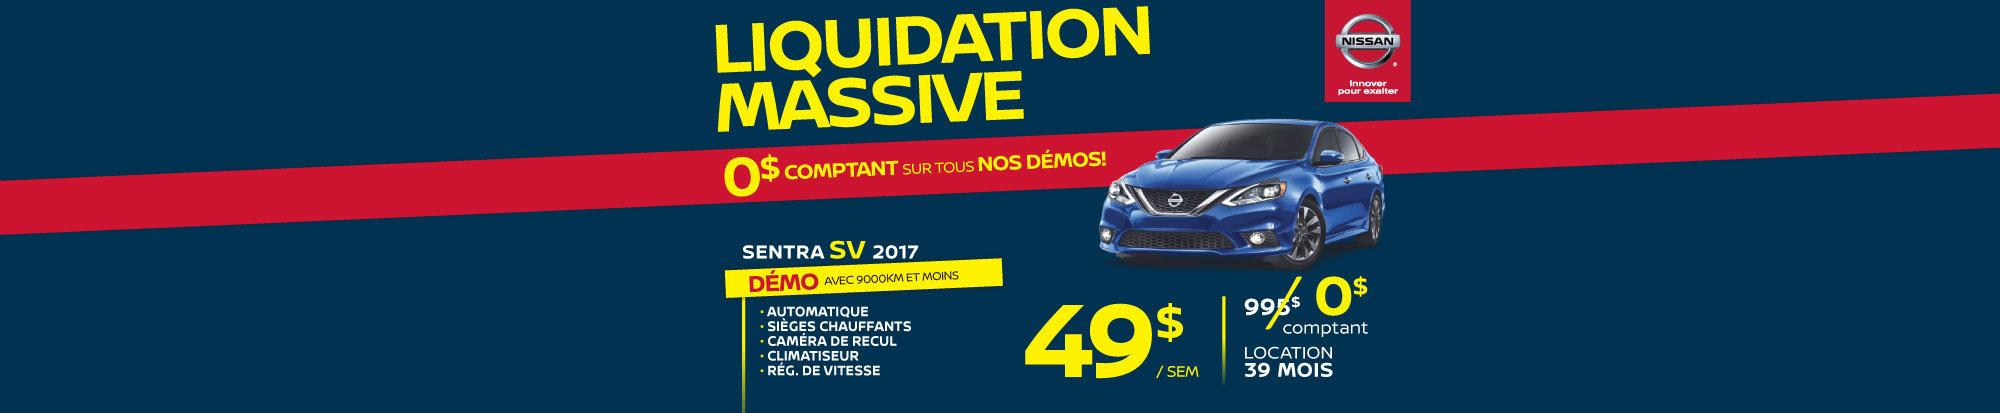 Liquidation massive Sentra SV 2017 web